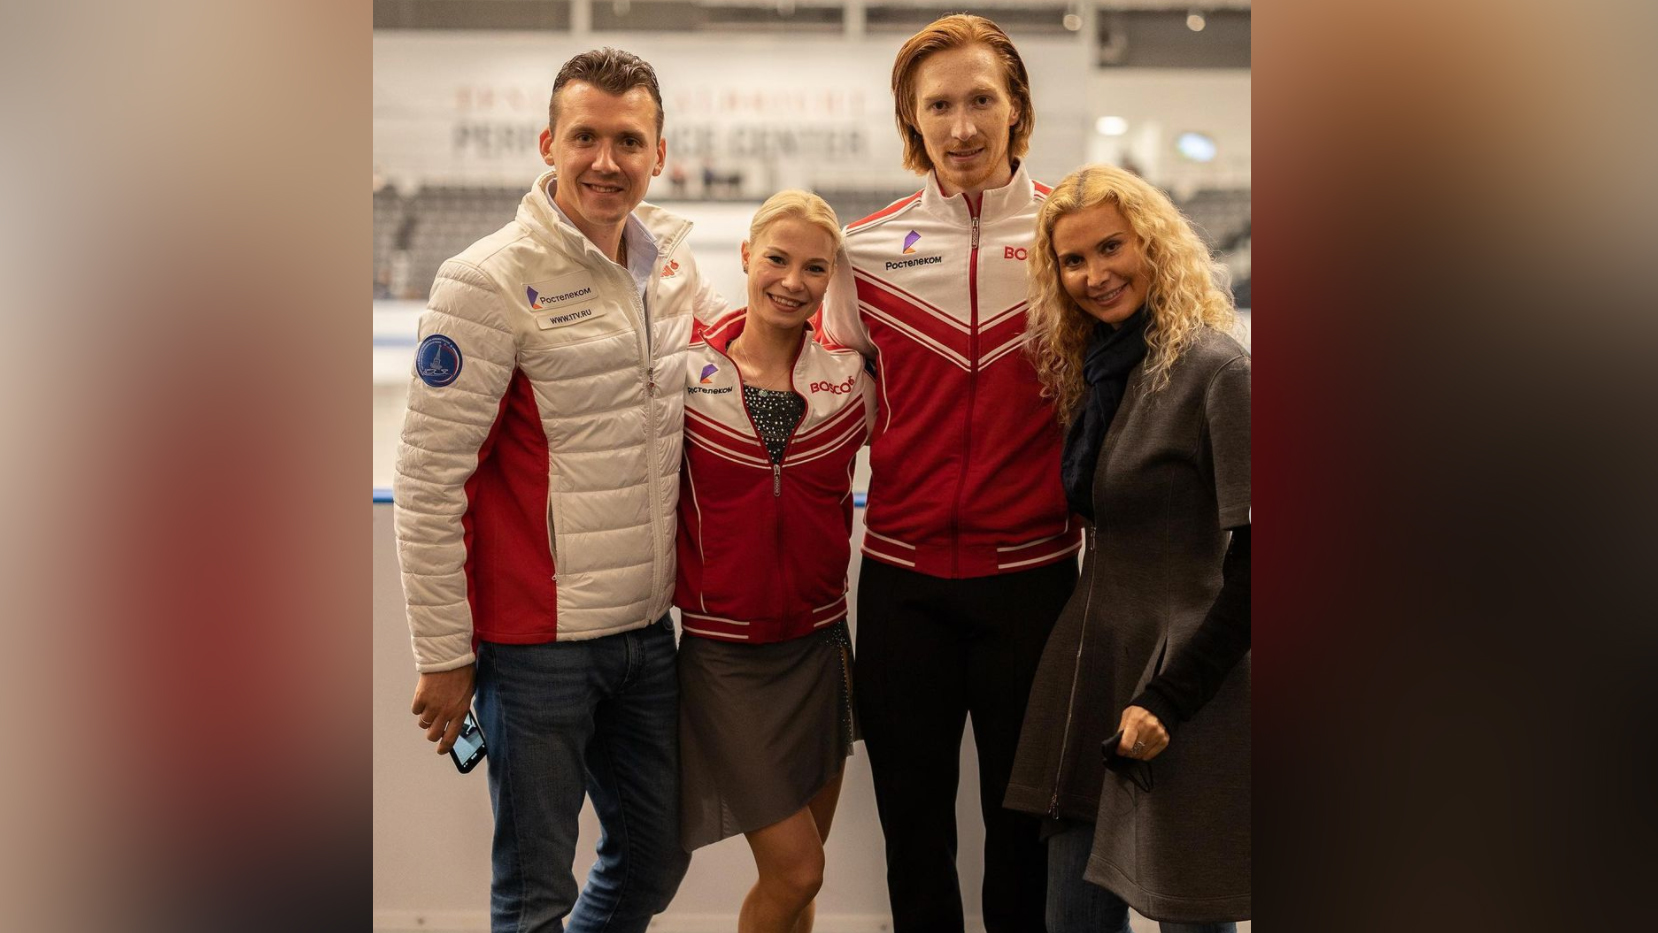 Павел Слюсаренко, Евгения Тарасова, Владимир Морозов и Этери Тутберидзе. Фото © Instagram / tutberidze.eteri